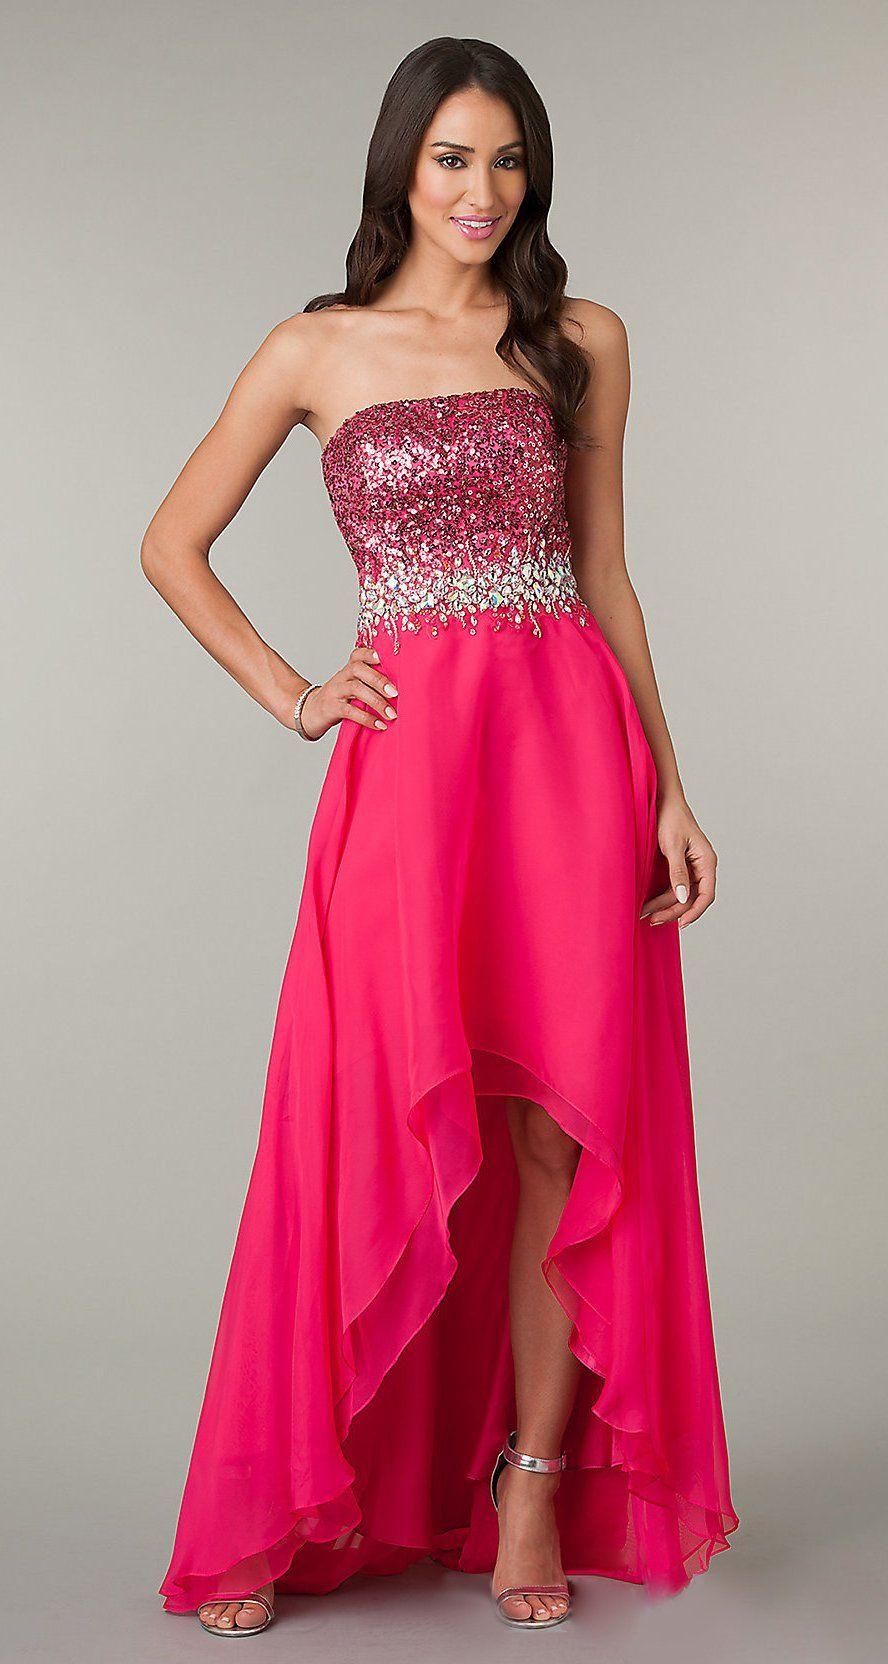 7d71ecc83e72c Beautiful High Low Watermelon Formal Prom Dress Strapless Sequins $199.99